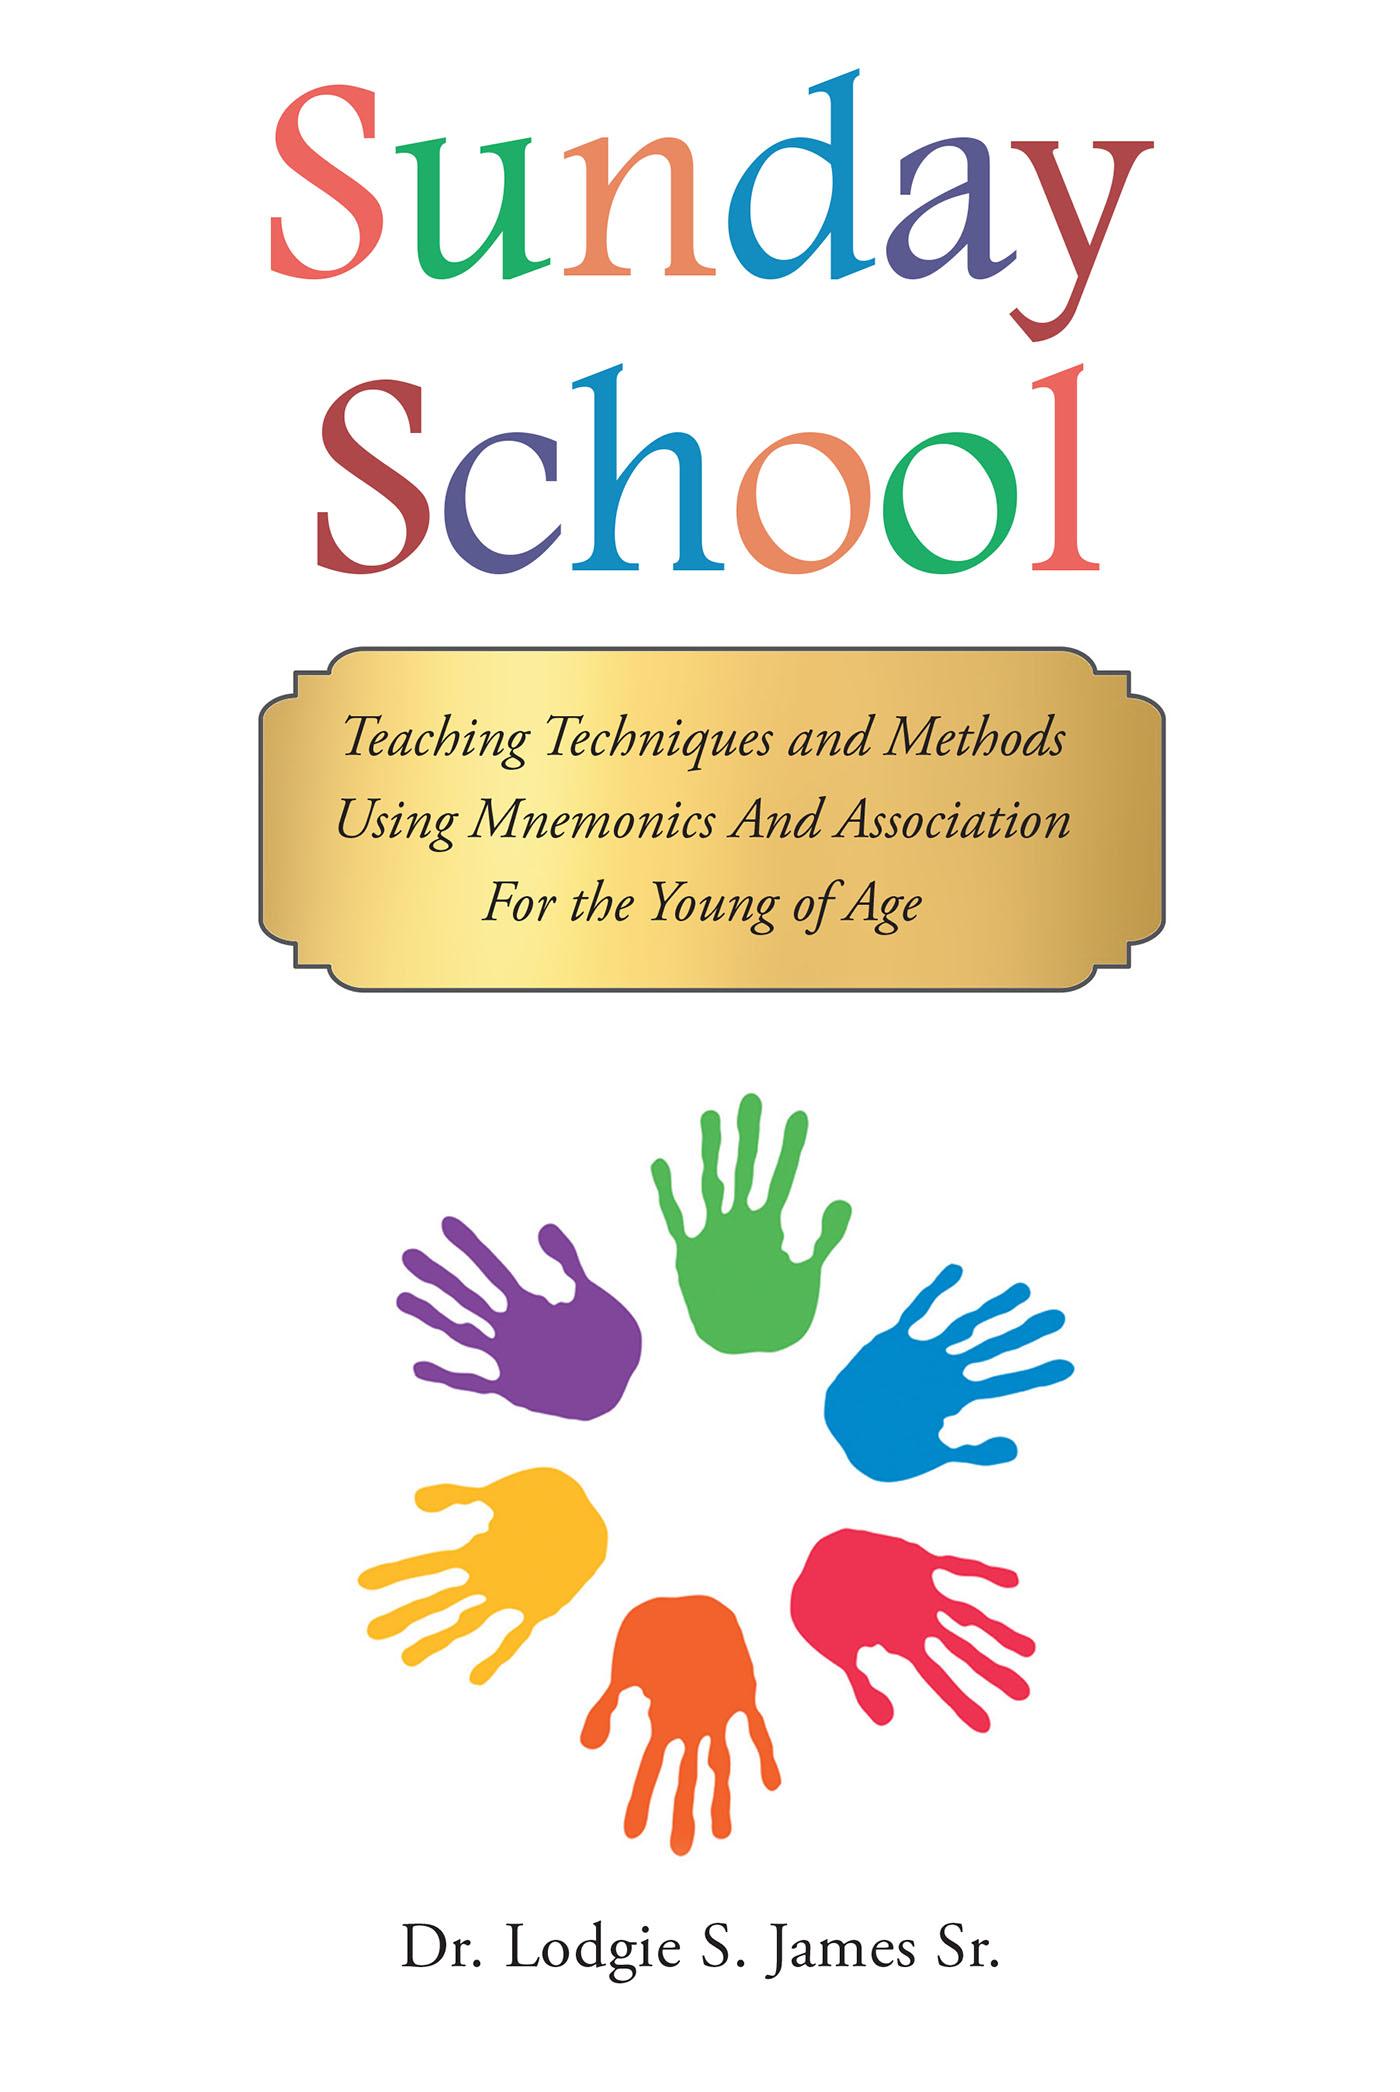 Sunday School Book Cover : Books christian faith publishing free kit